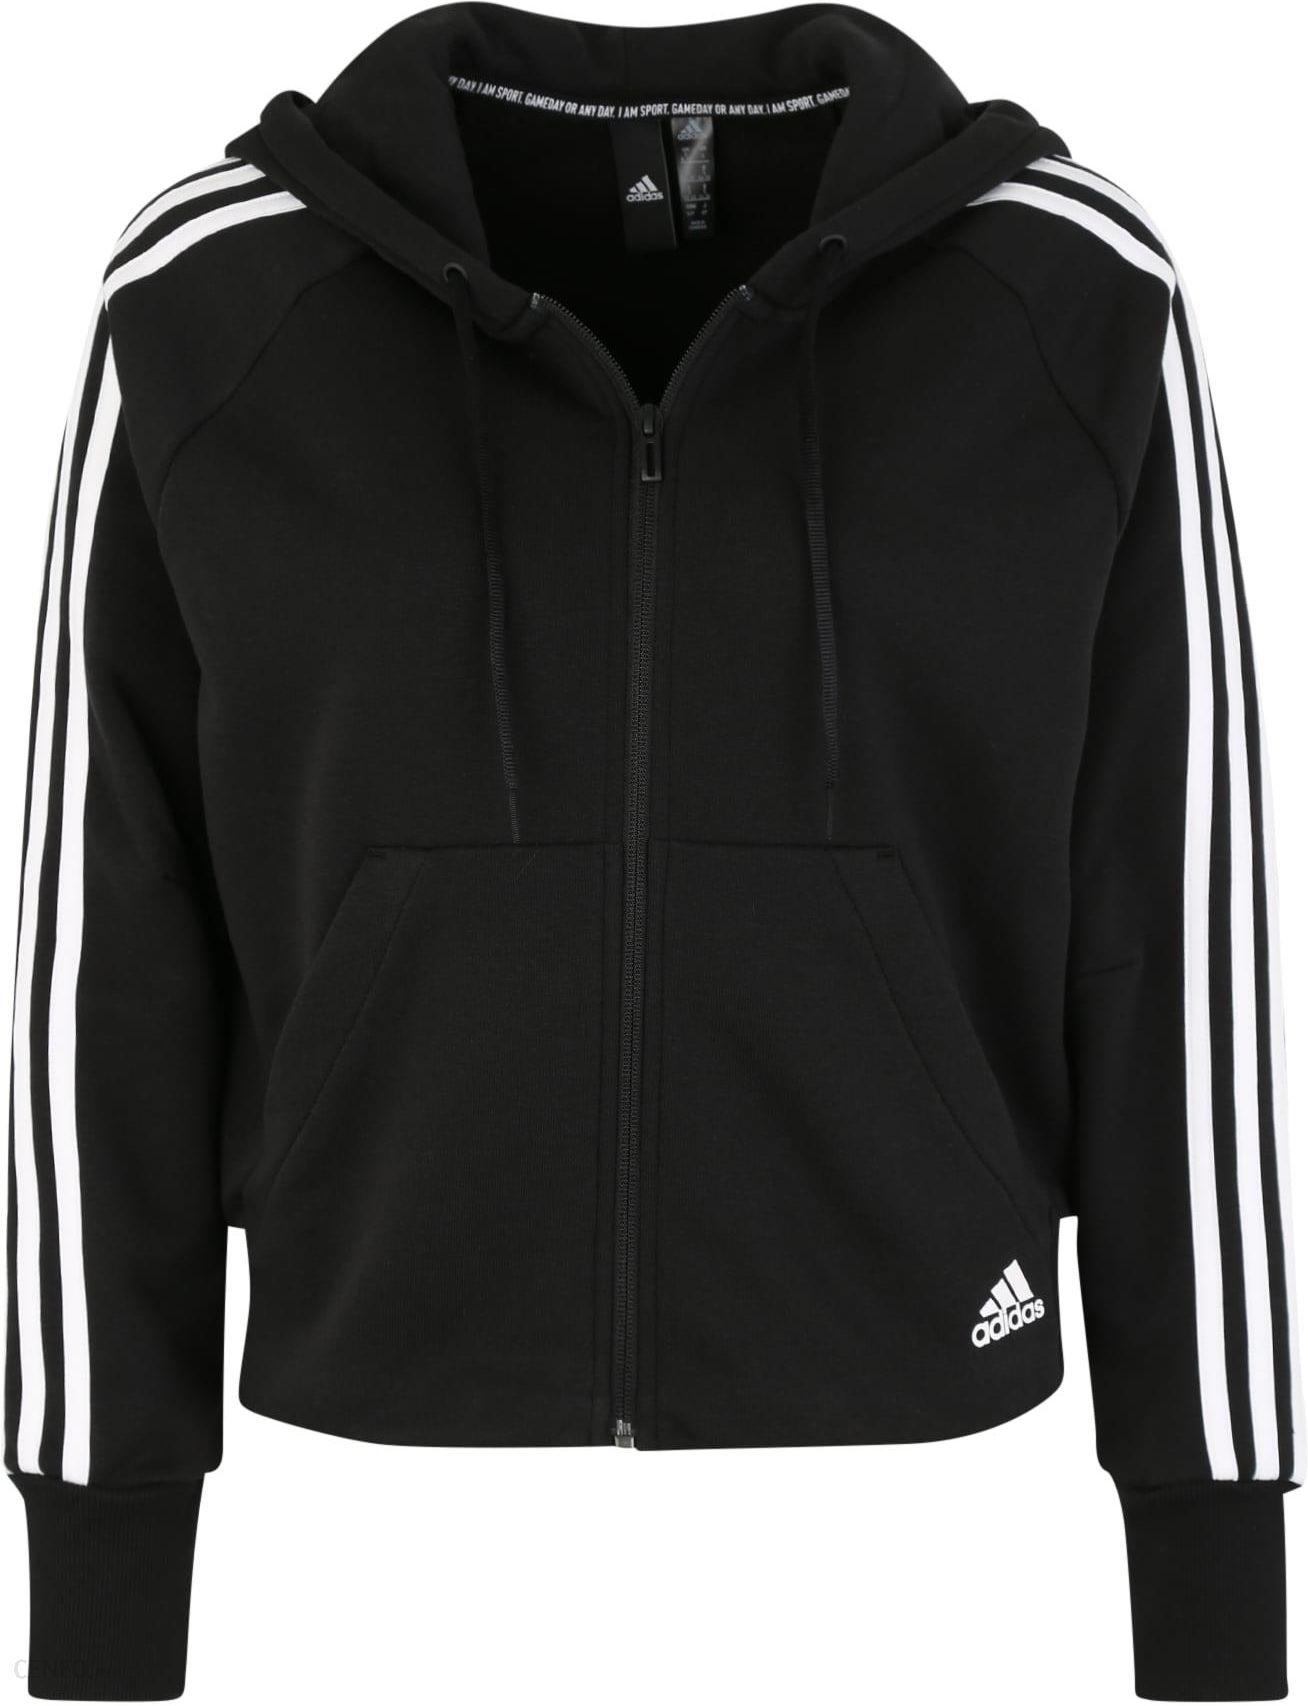 adidas perfiormance the pack bluza czarny